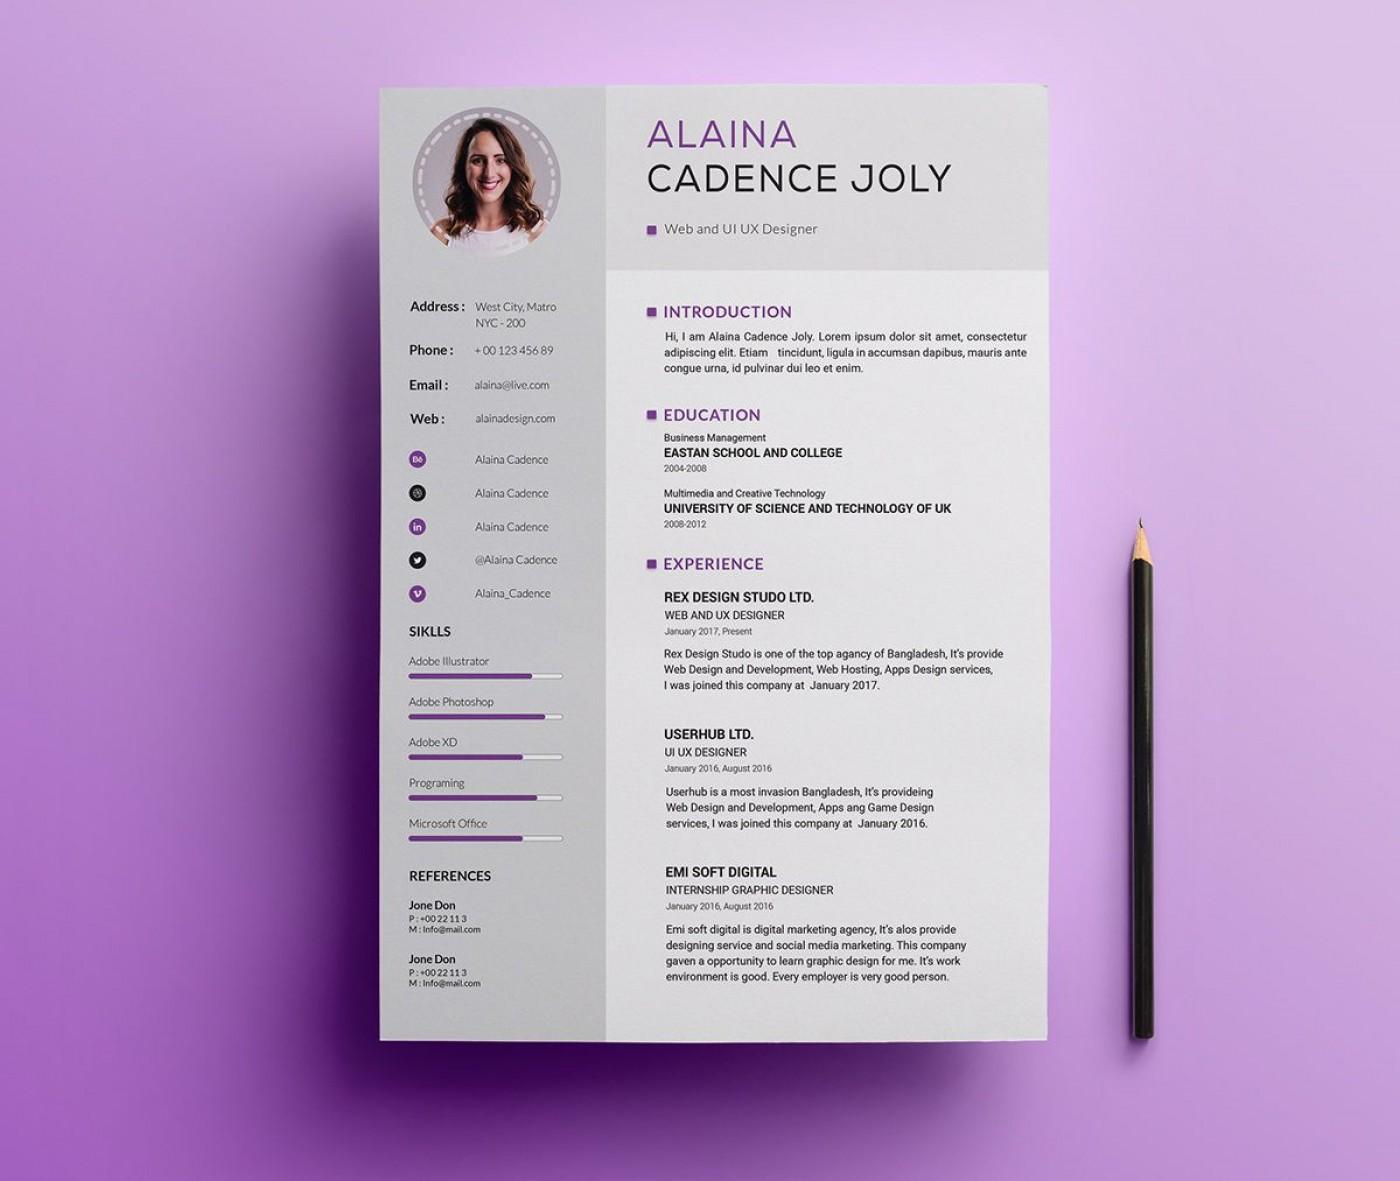 005 Impressive Professional Resume Template 2018 Free Download Idea 1400